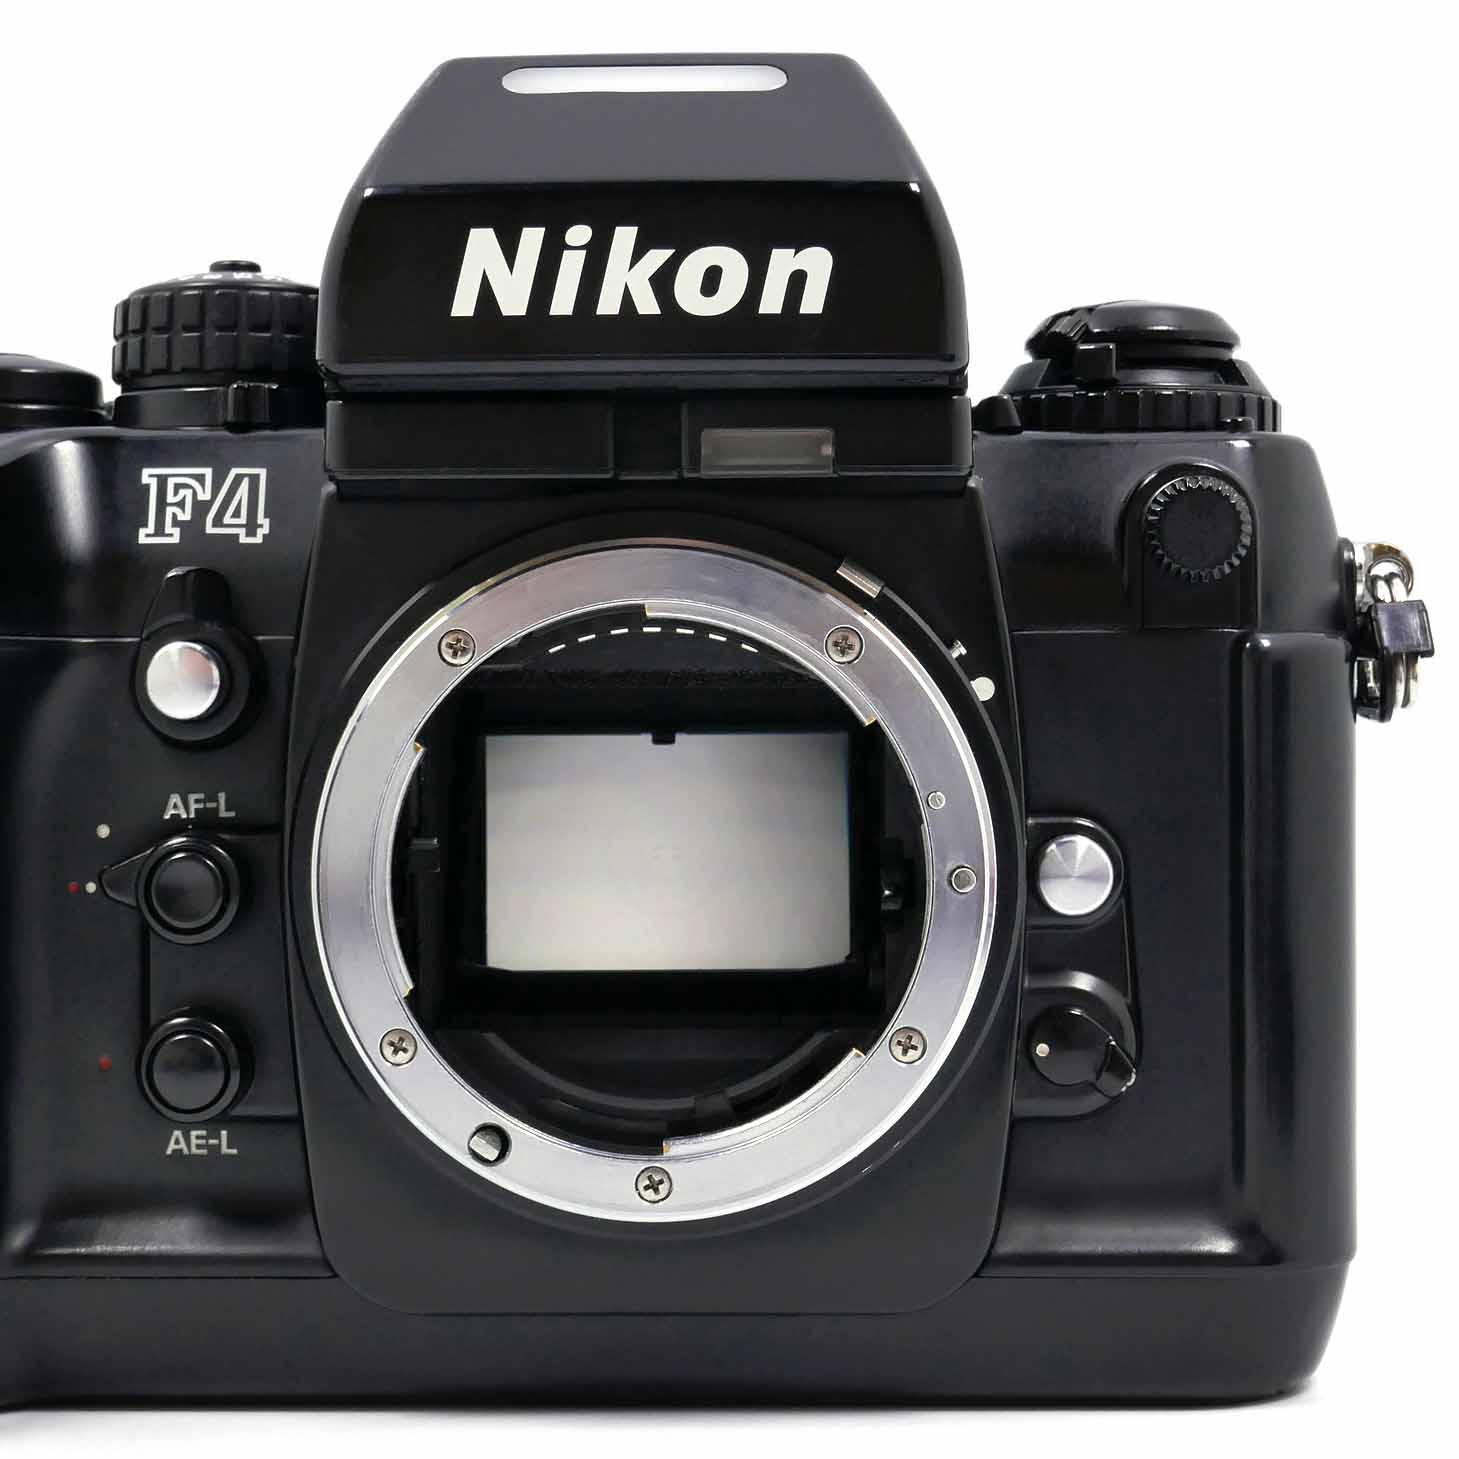 clean-cameras-Nikon-F4-+Nikon--MB-21-02